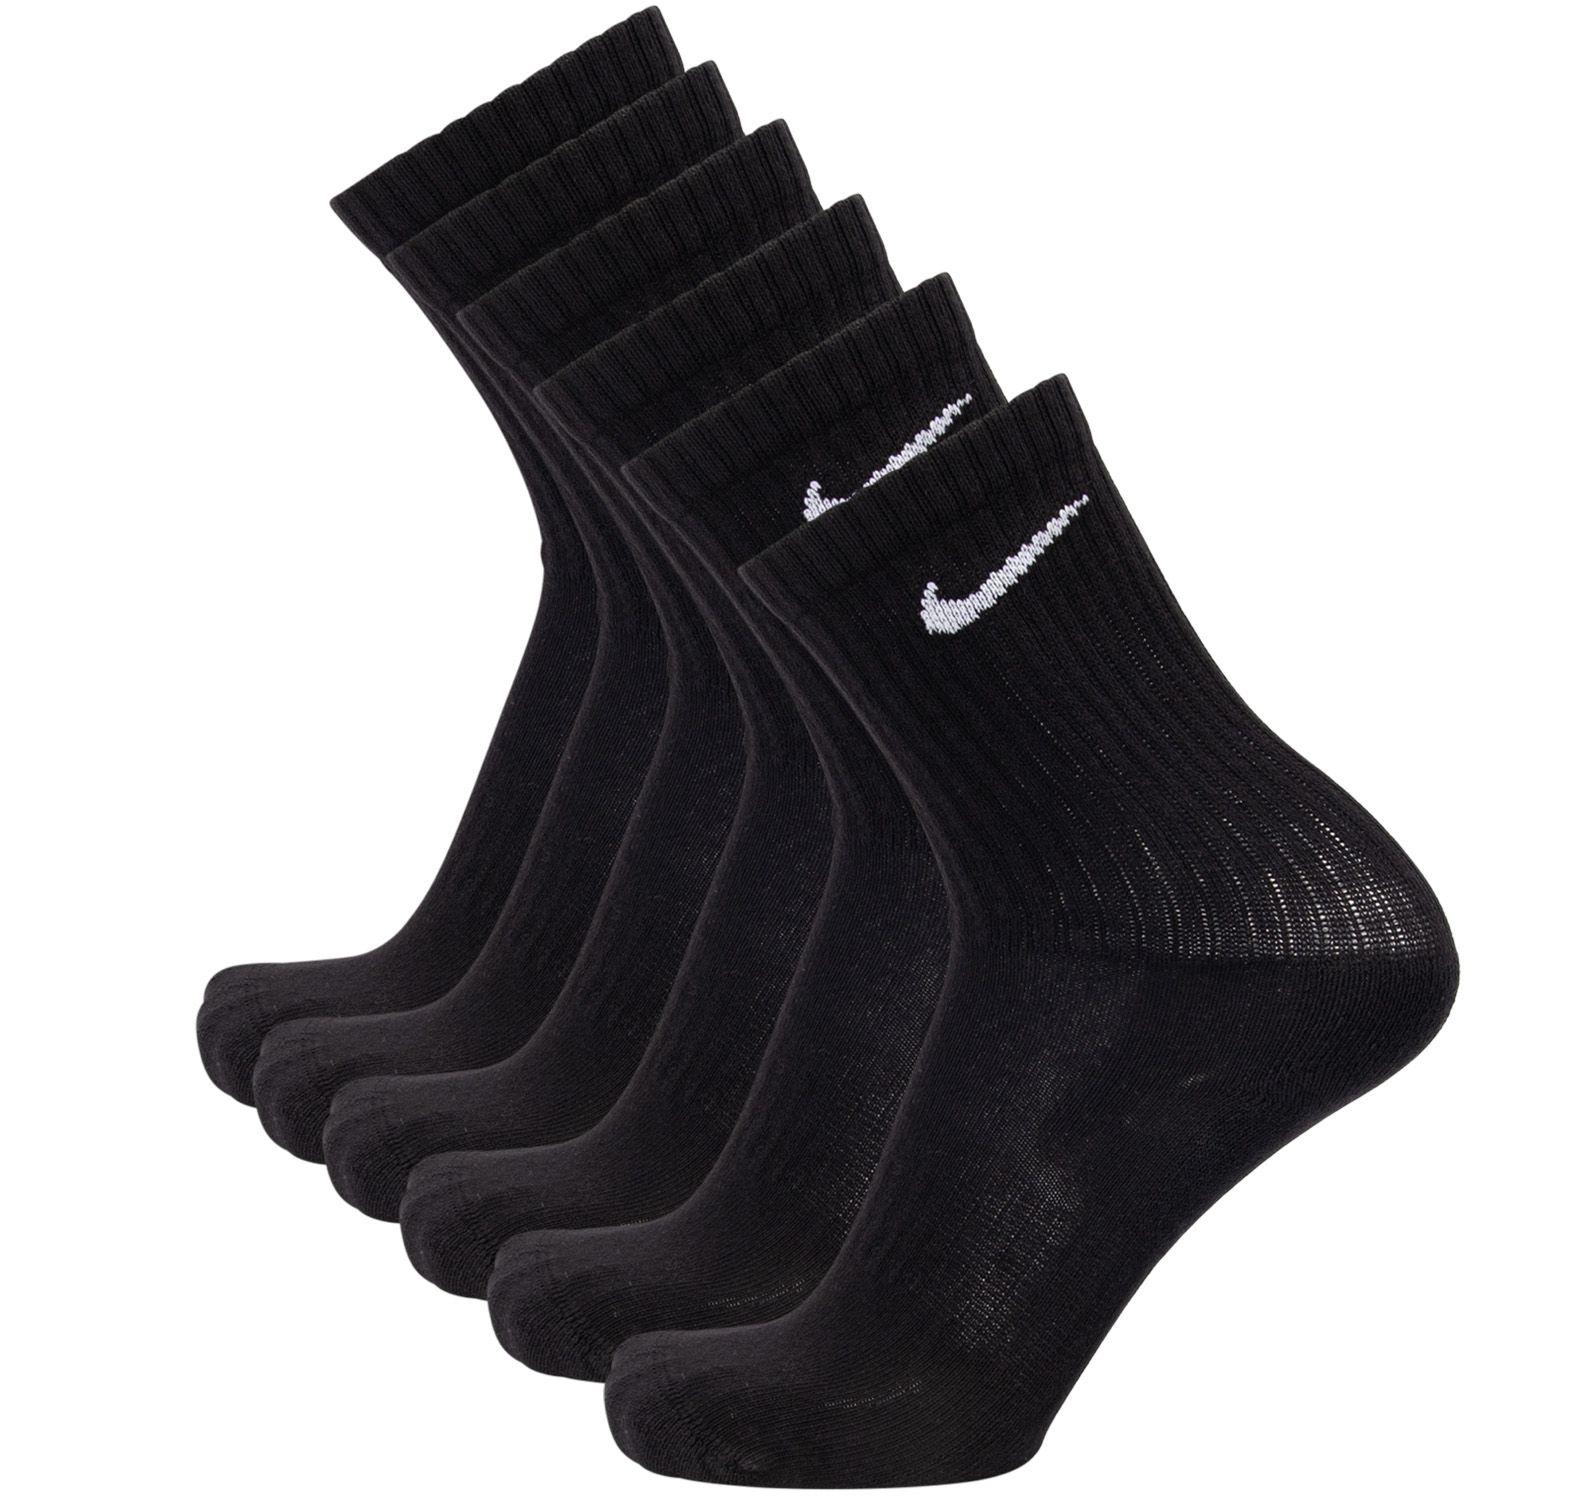 6-Pack Nike Sportsockar Cushion Crew, Black/White, L,  Nike